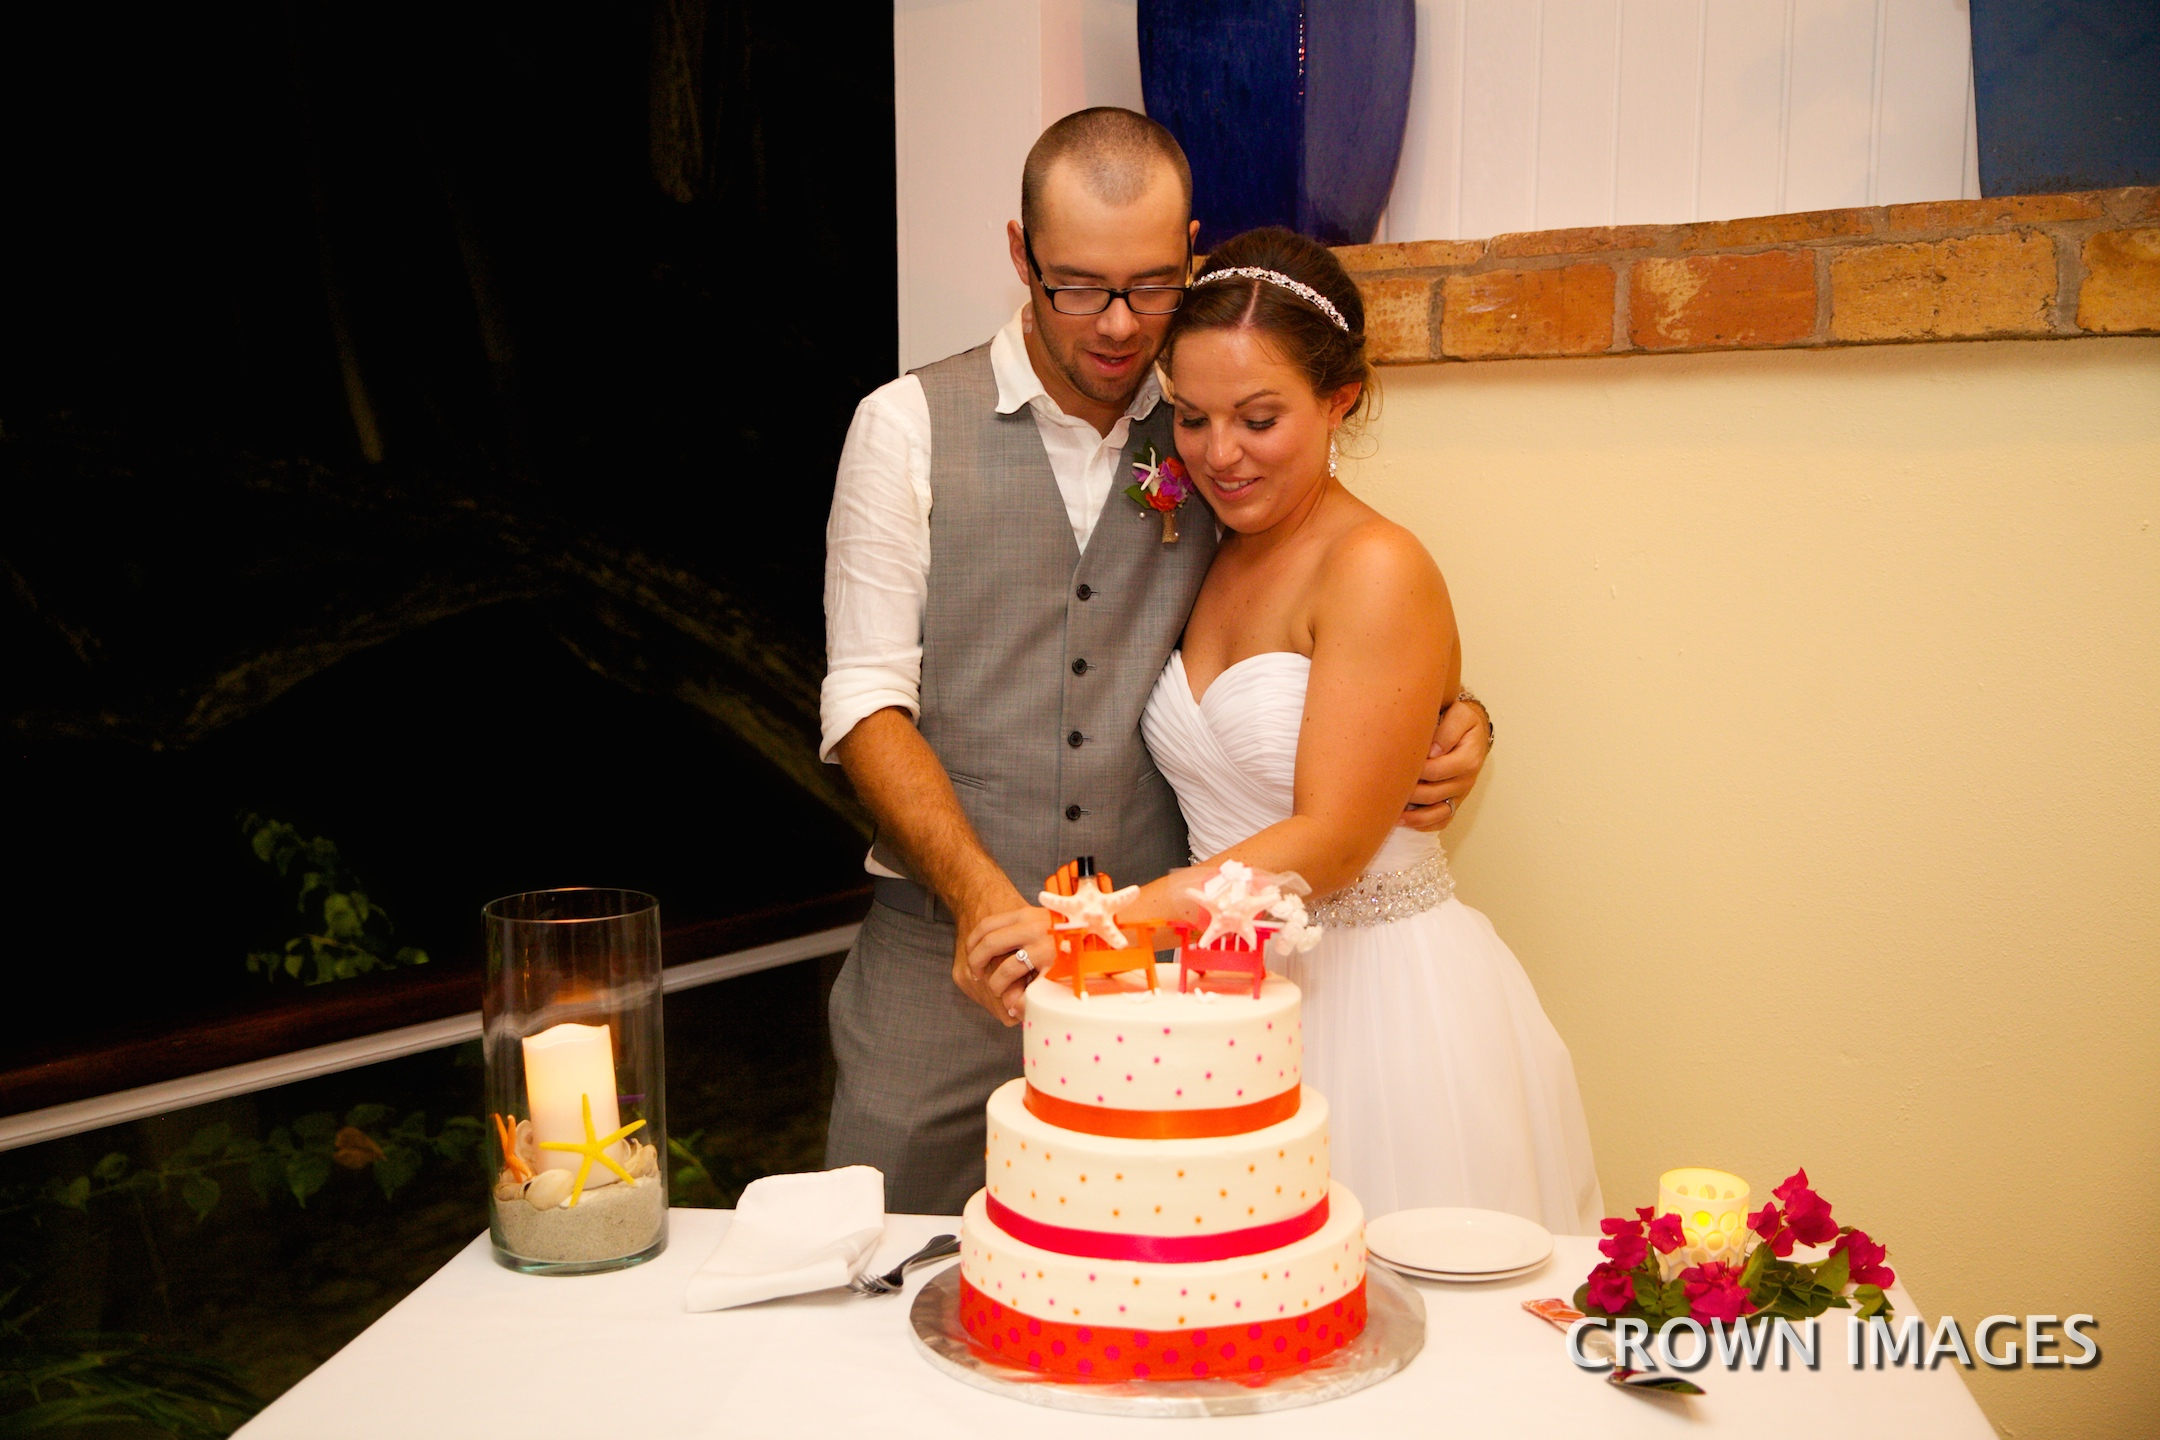 cake cutting at a wedding on st john